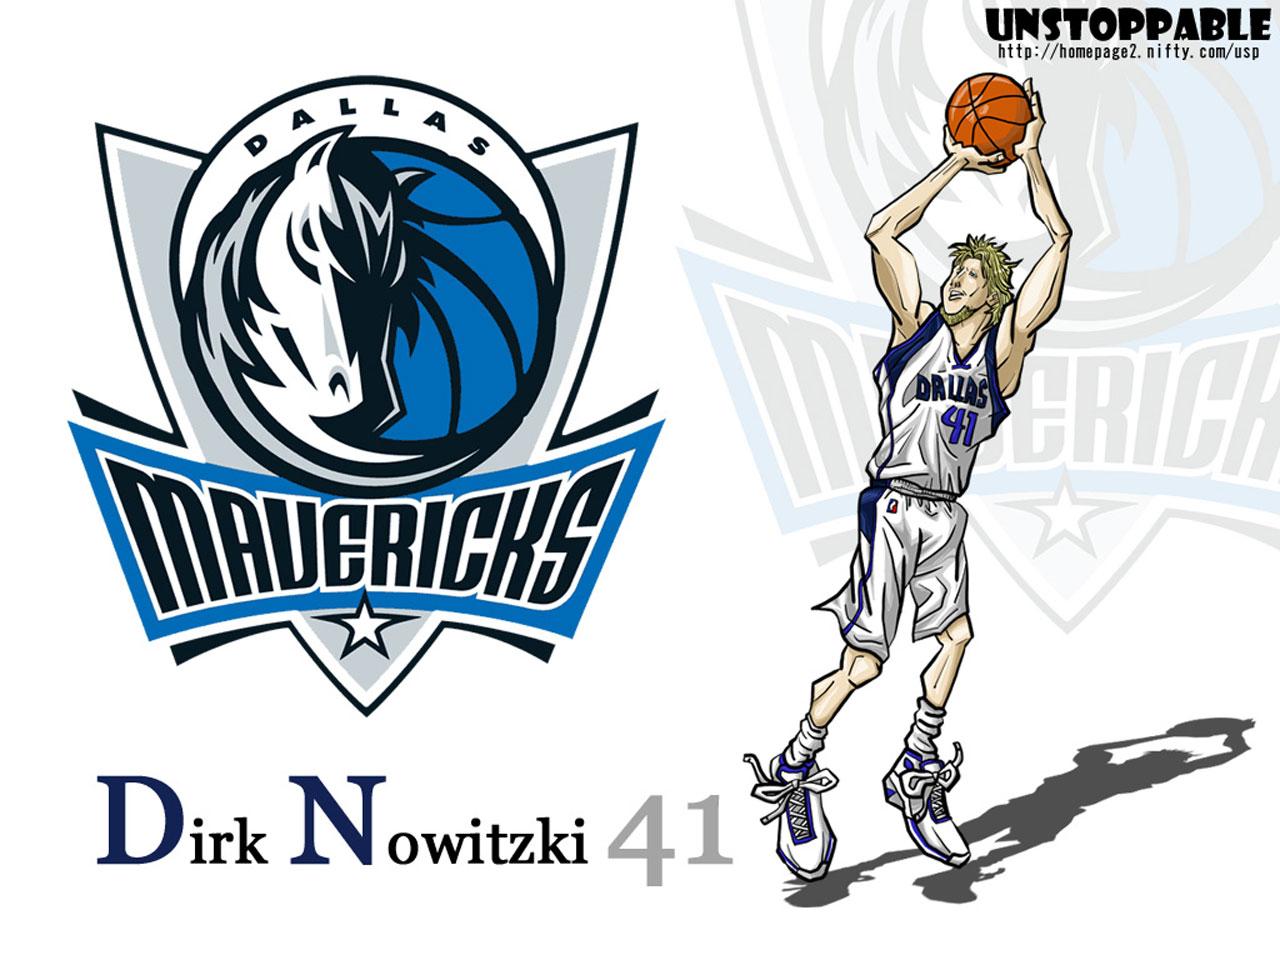 Dirk Nowitzki Drawn Wallpaper - Basketball Wallpapers